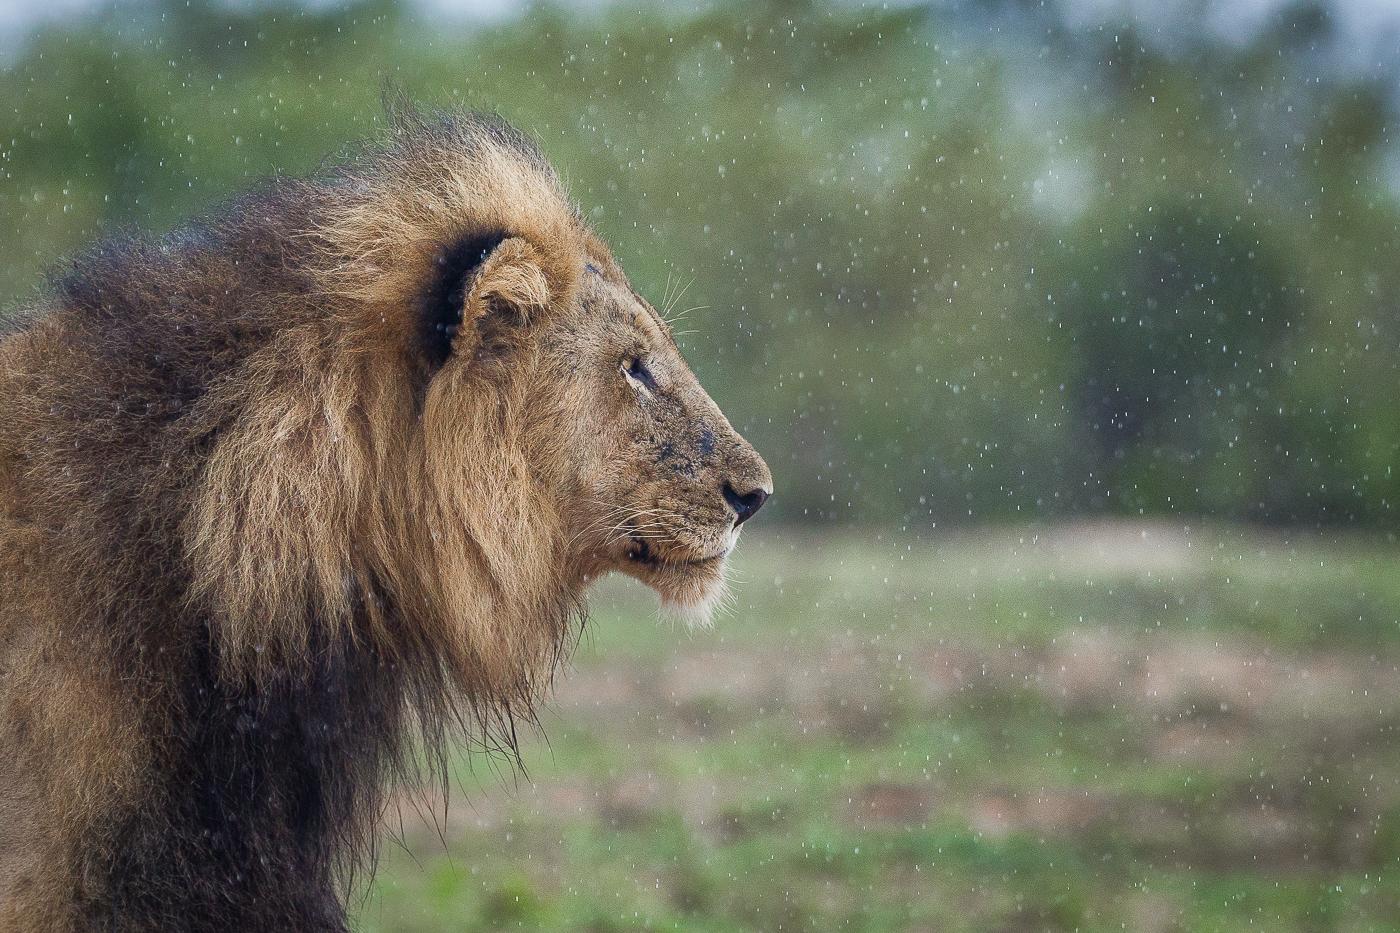 majingi in the rain